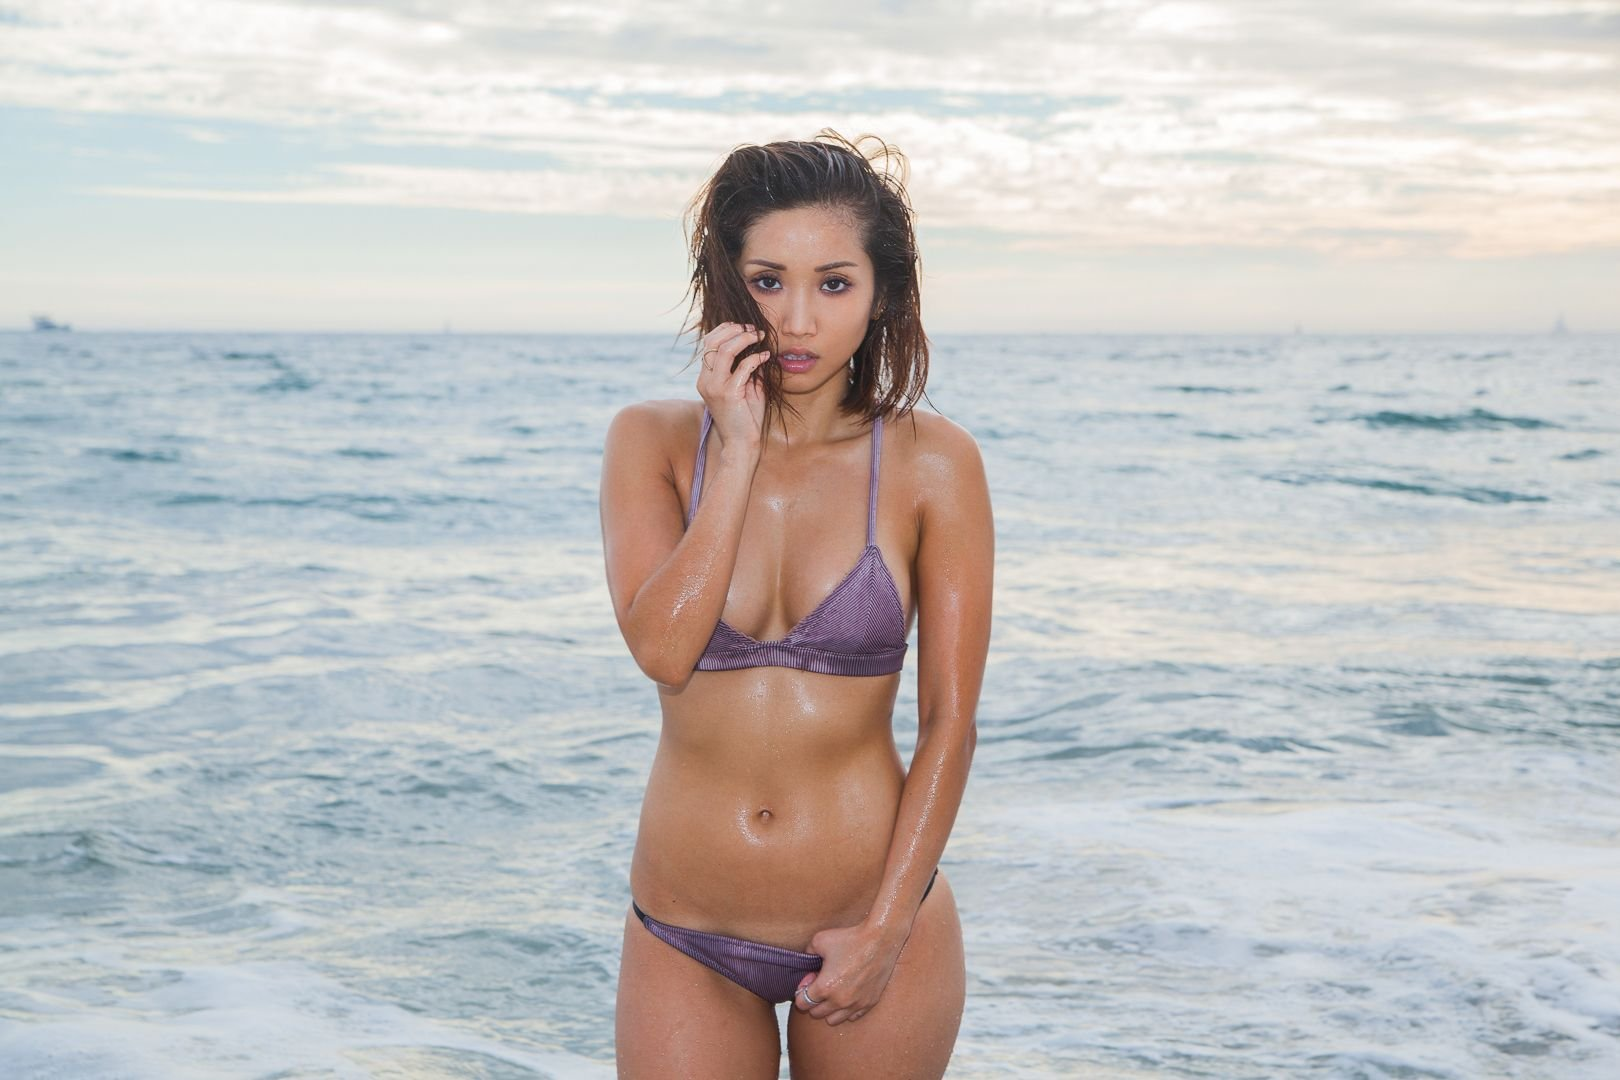 Sexy brenda song nude